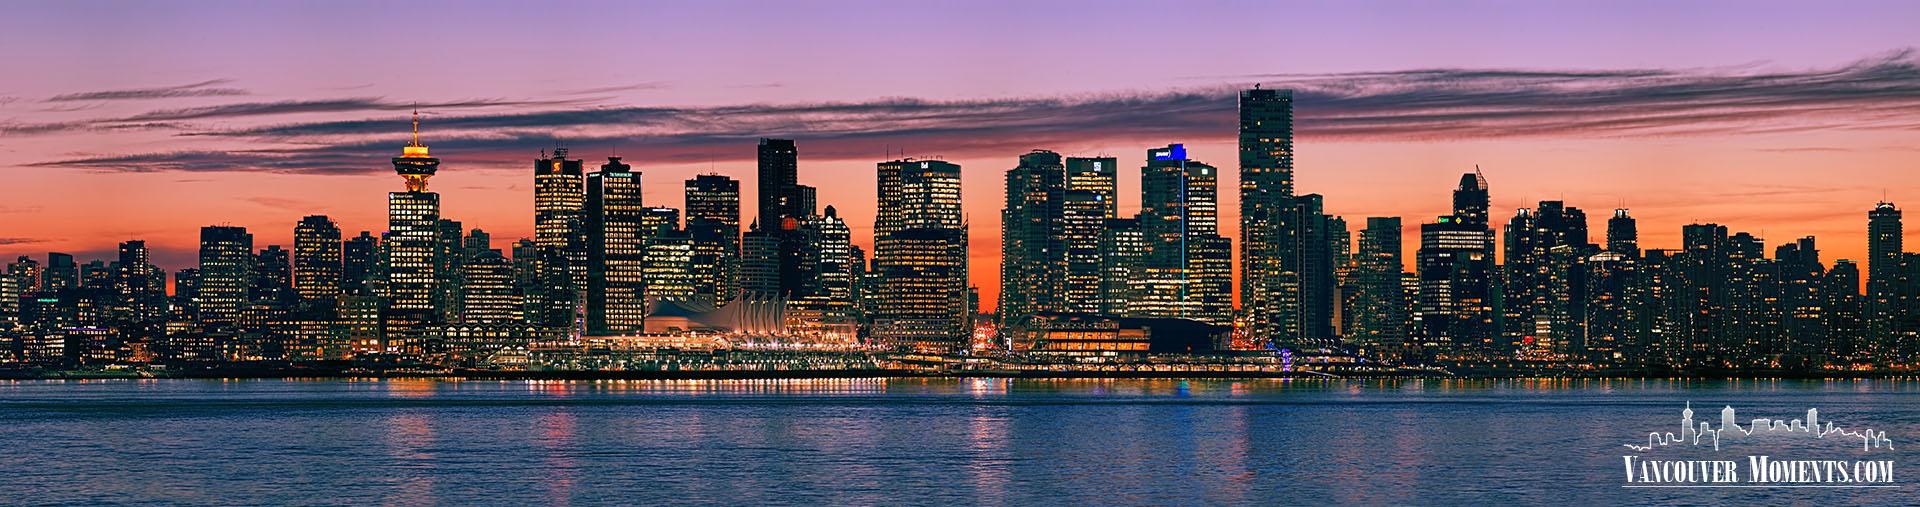 Vanc_Skyline_Sunset2_VS062A1